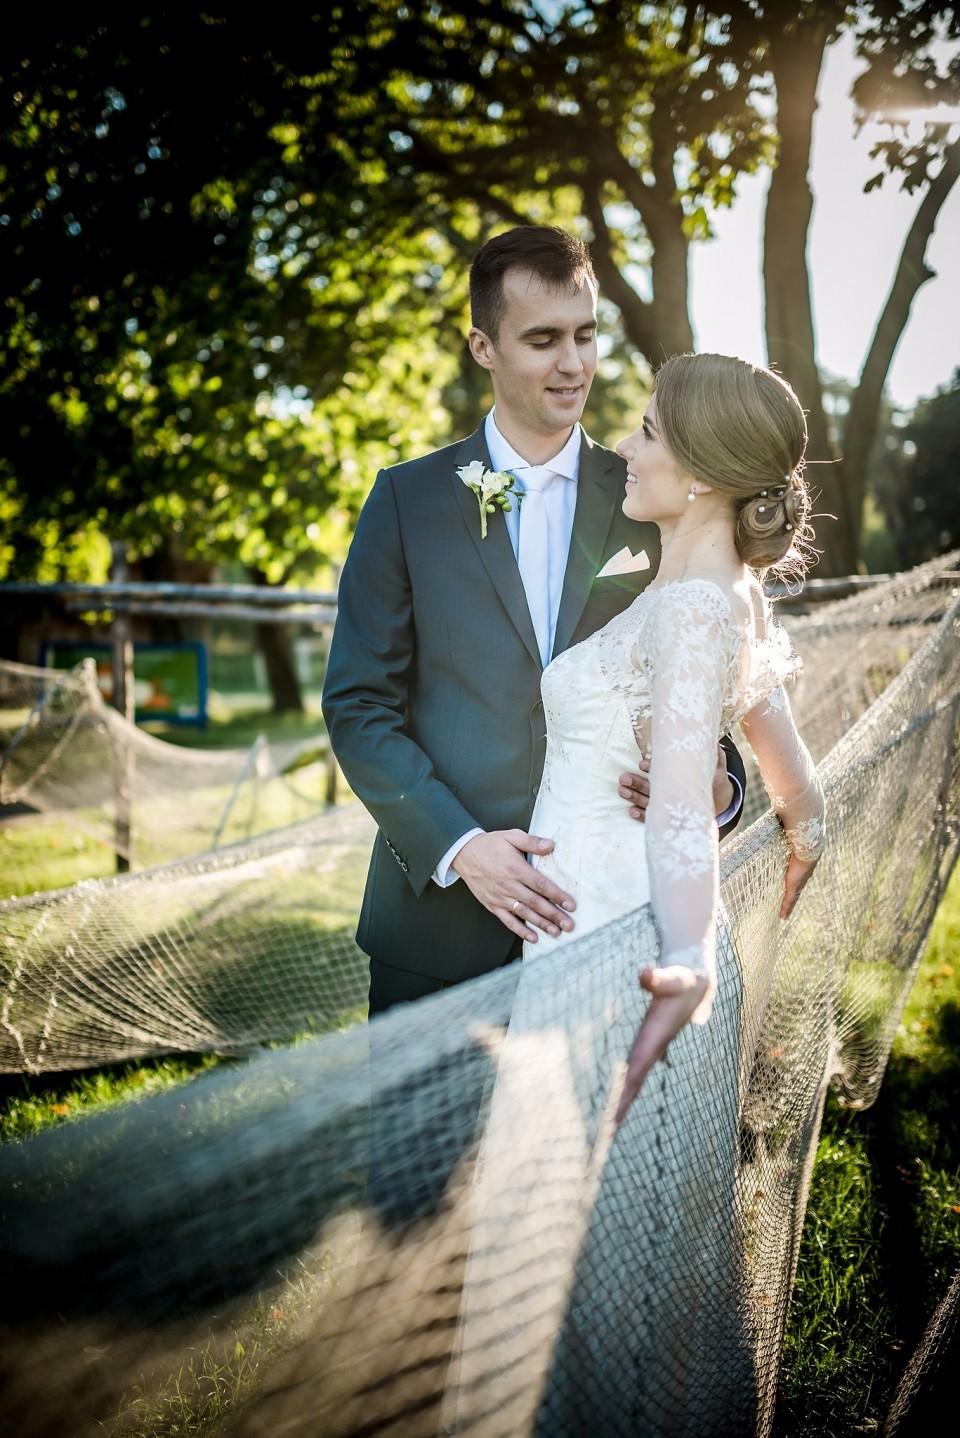 Profesionalus vestuvių fotografas. fotografas Andrius Pelakauskas www.fotopolis.lt